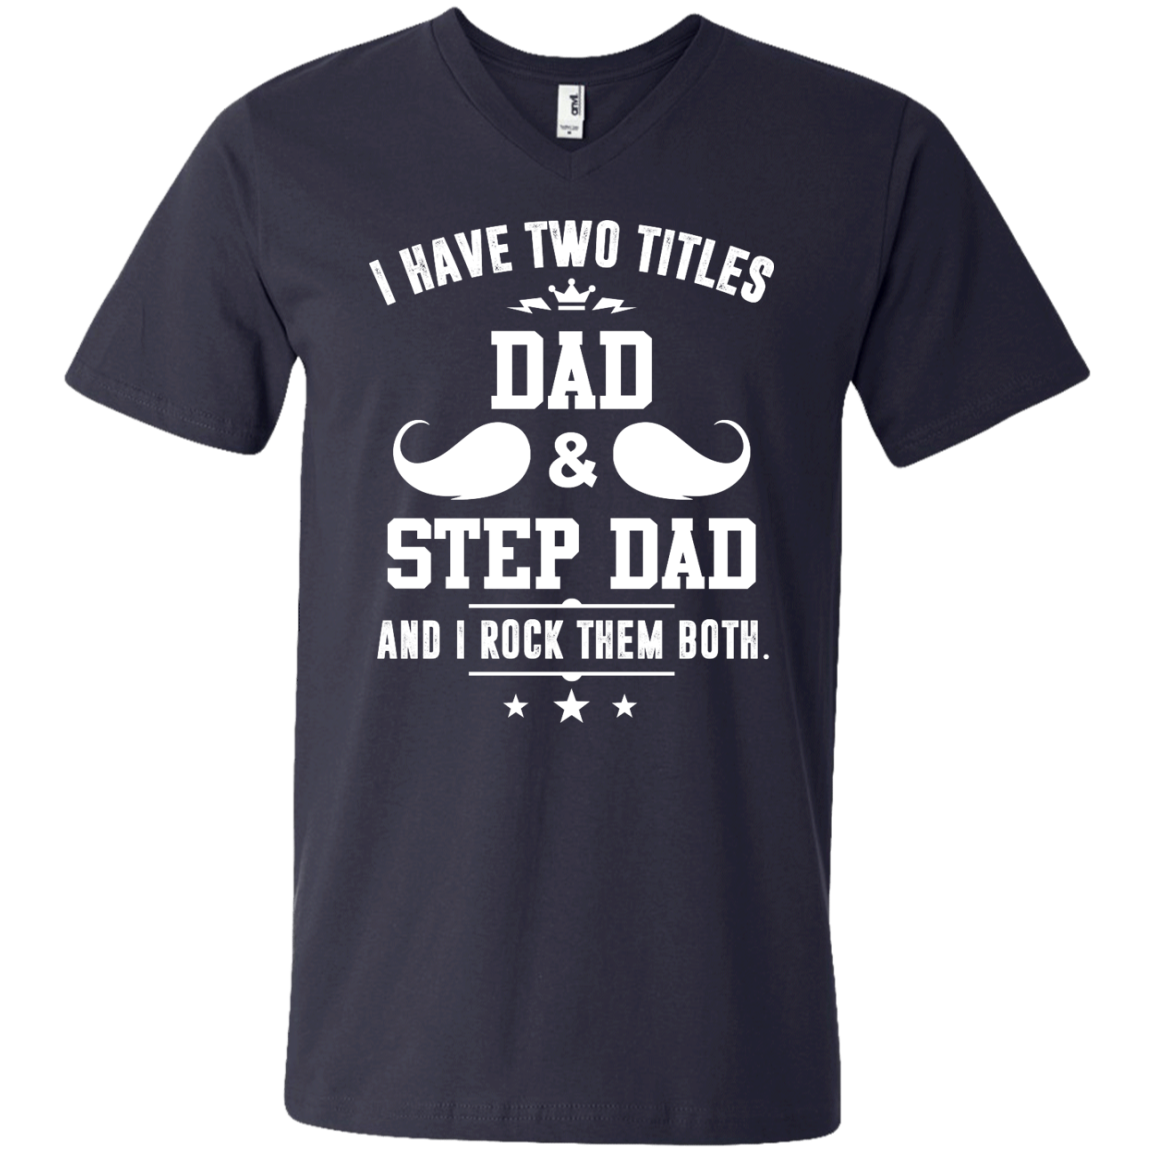 982 Anvil Men's Printed V-Neck T-Shirt